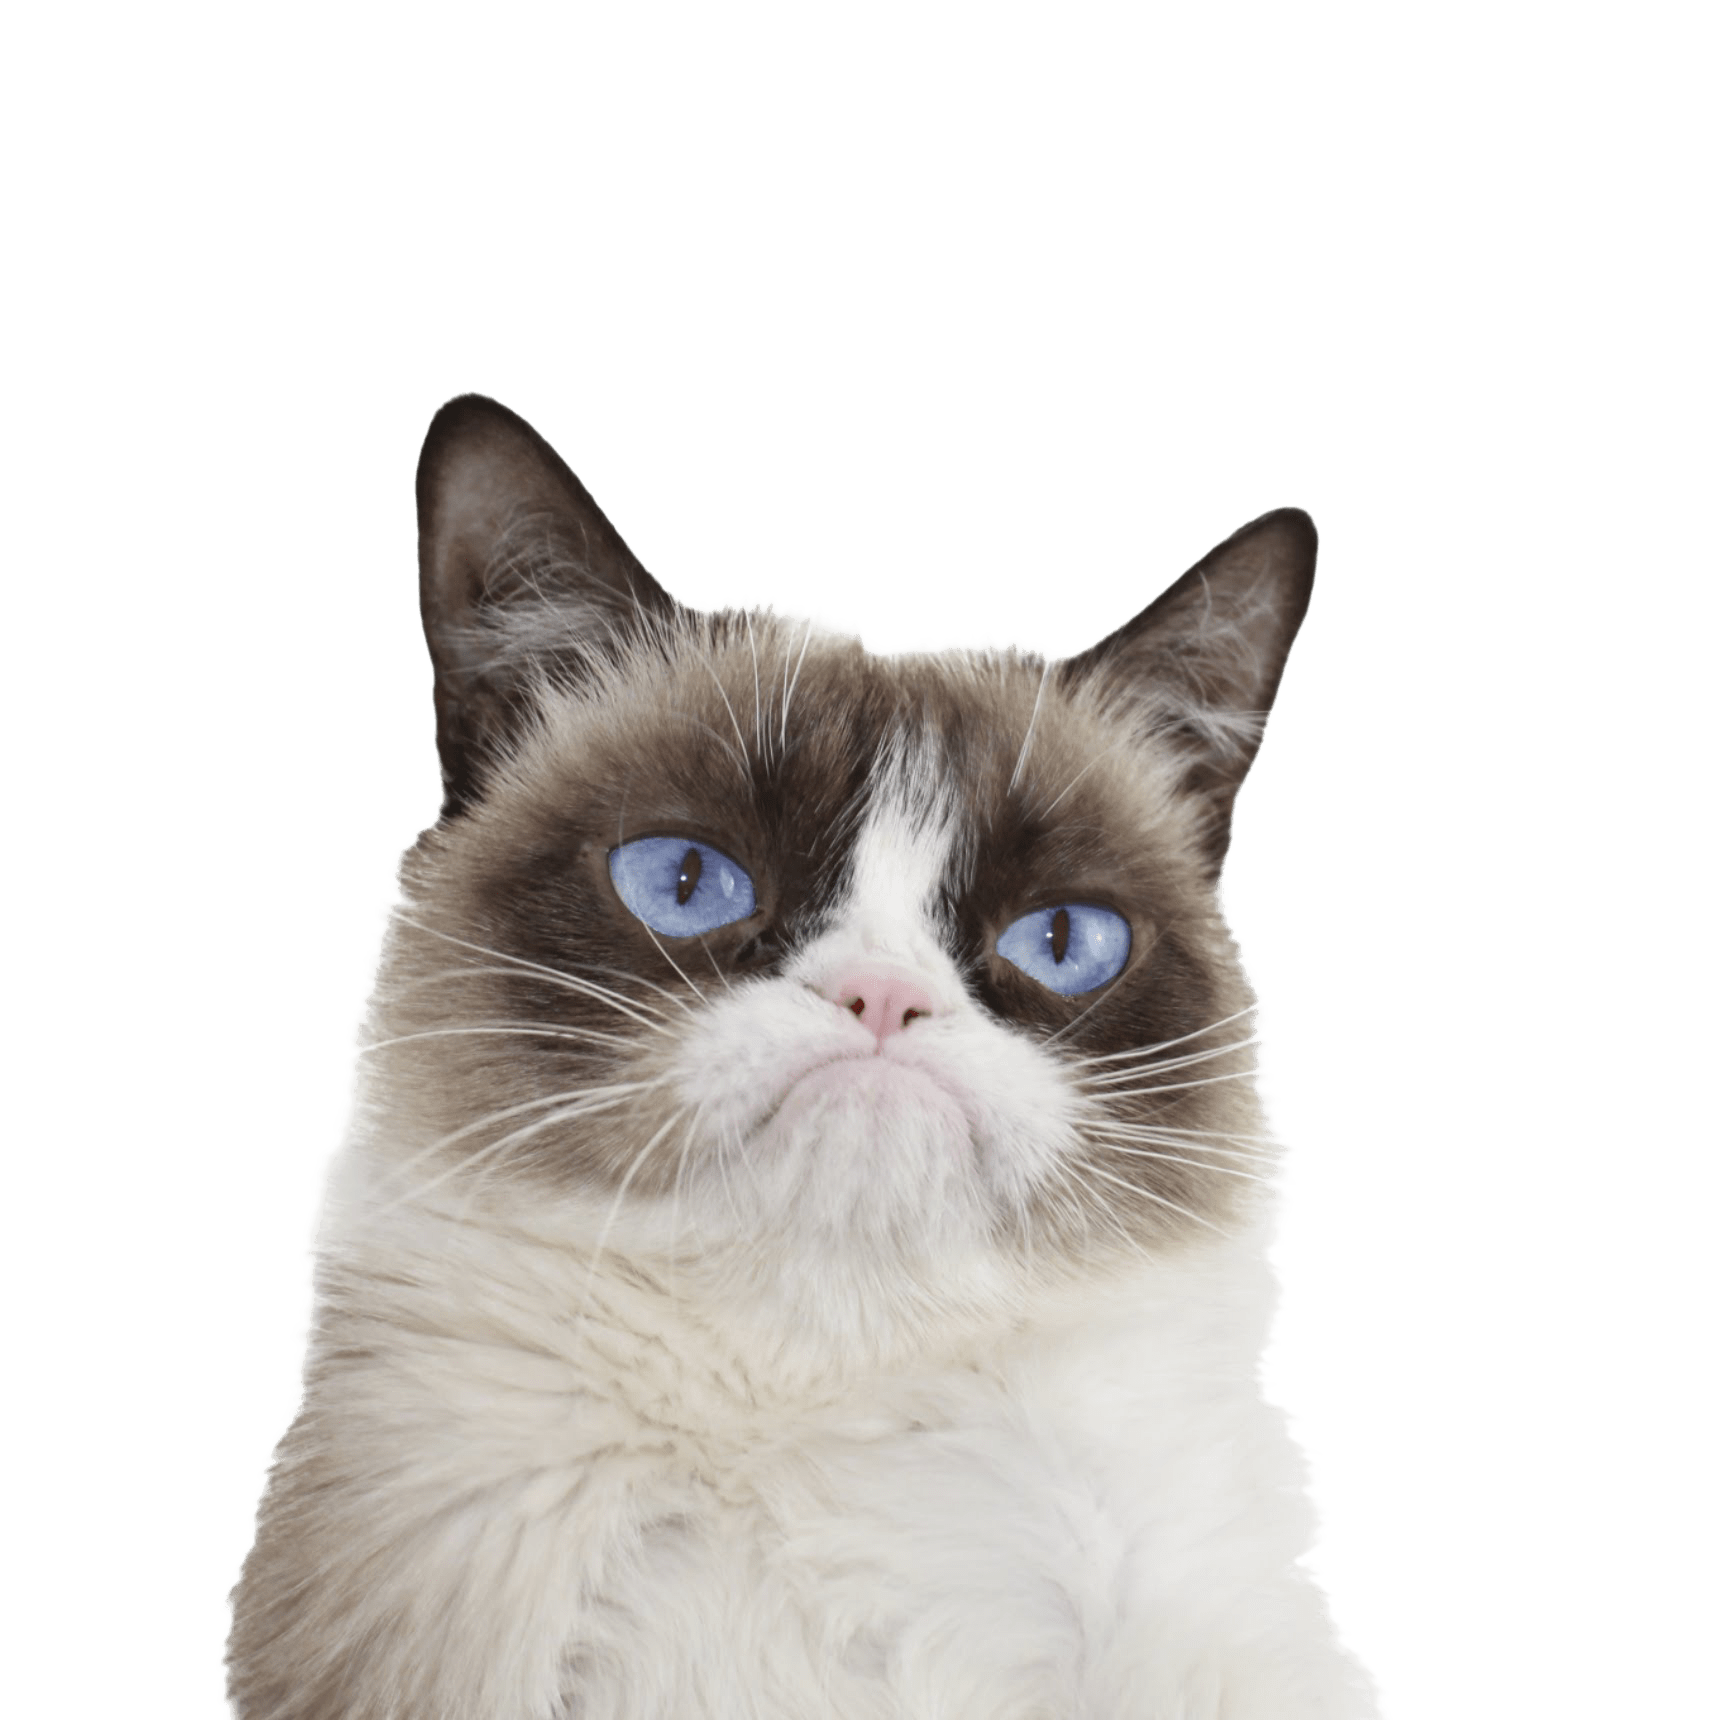 grumpy cat blue eyes transparent png stickpng